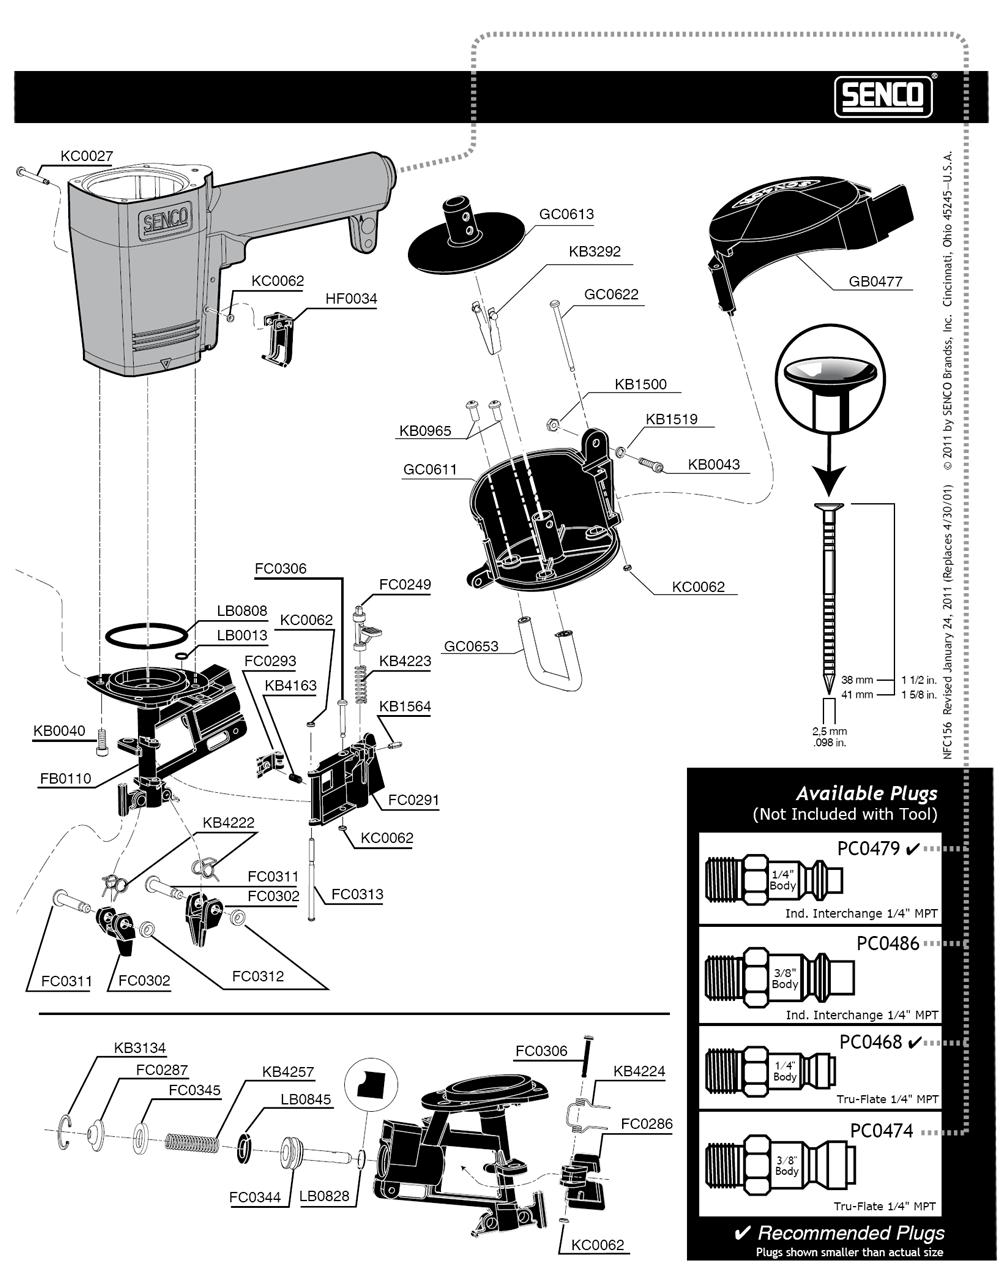 650004N-senco-PB-1Break Down